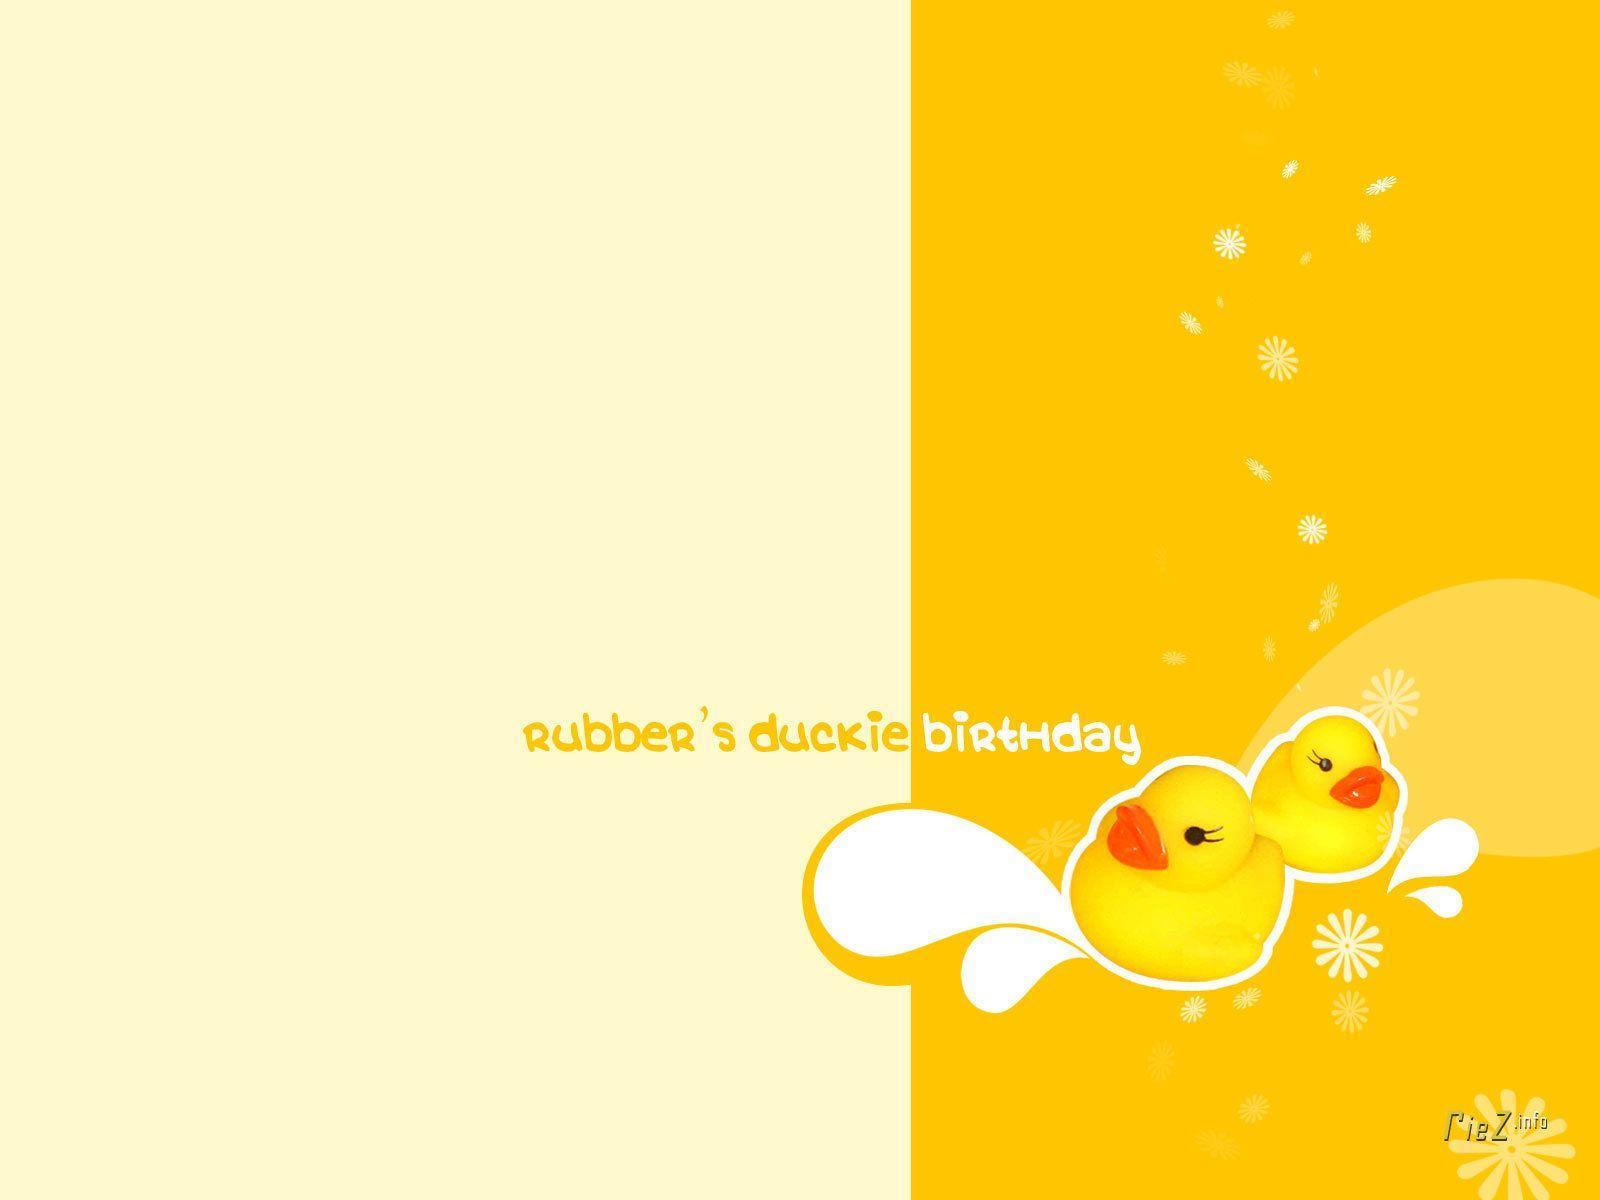 Yellow Rubber Ducks Wallpaper Border by Norwall LW7915N (2 Pack)